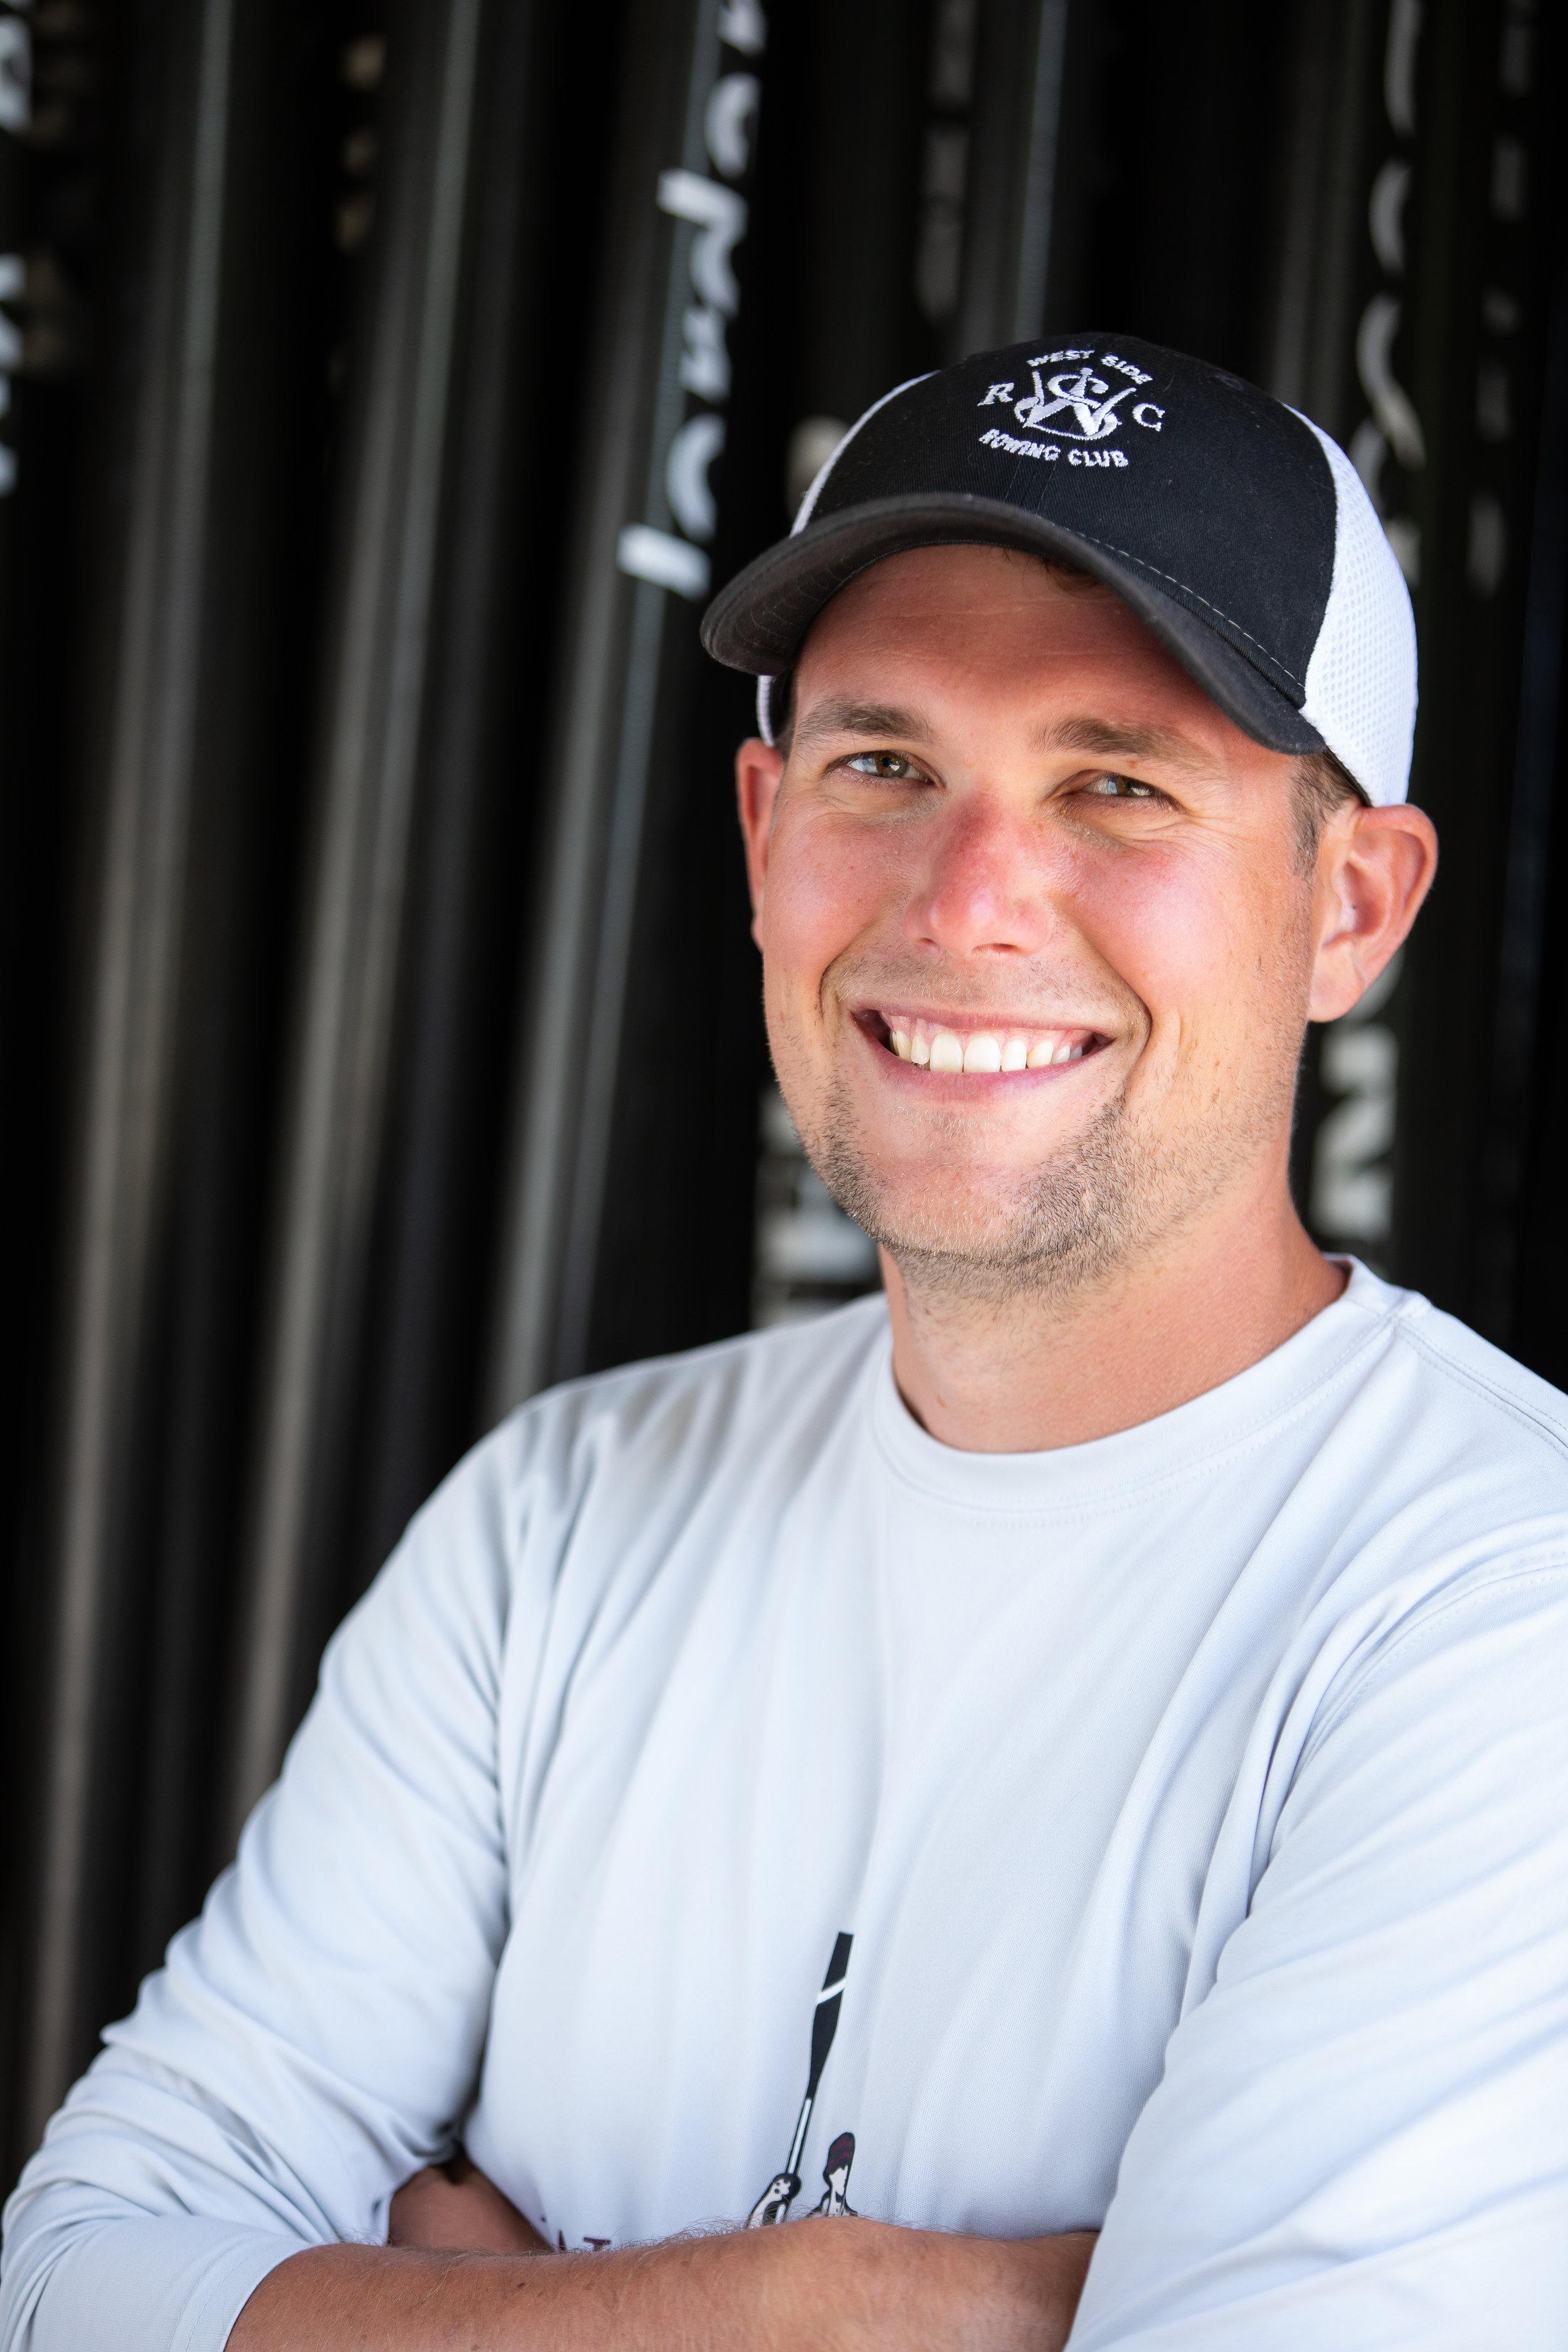 MICHAEL CUTE-Director of Rowing, and Senior Men's Head Coach - headcoachwsrc@gmail.com